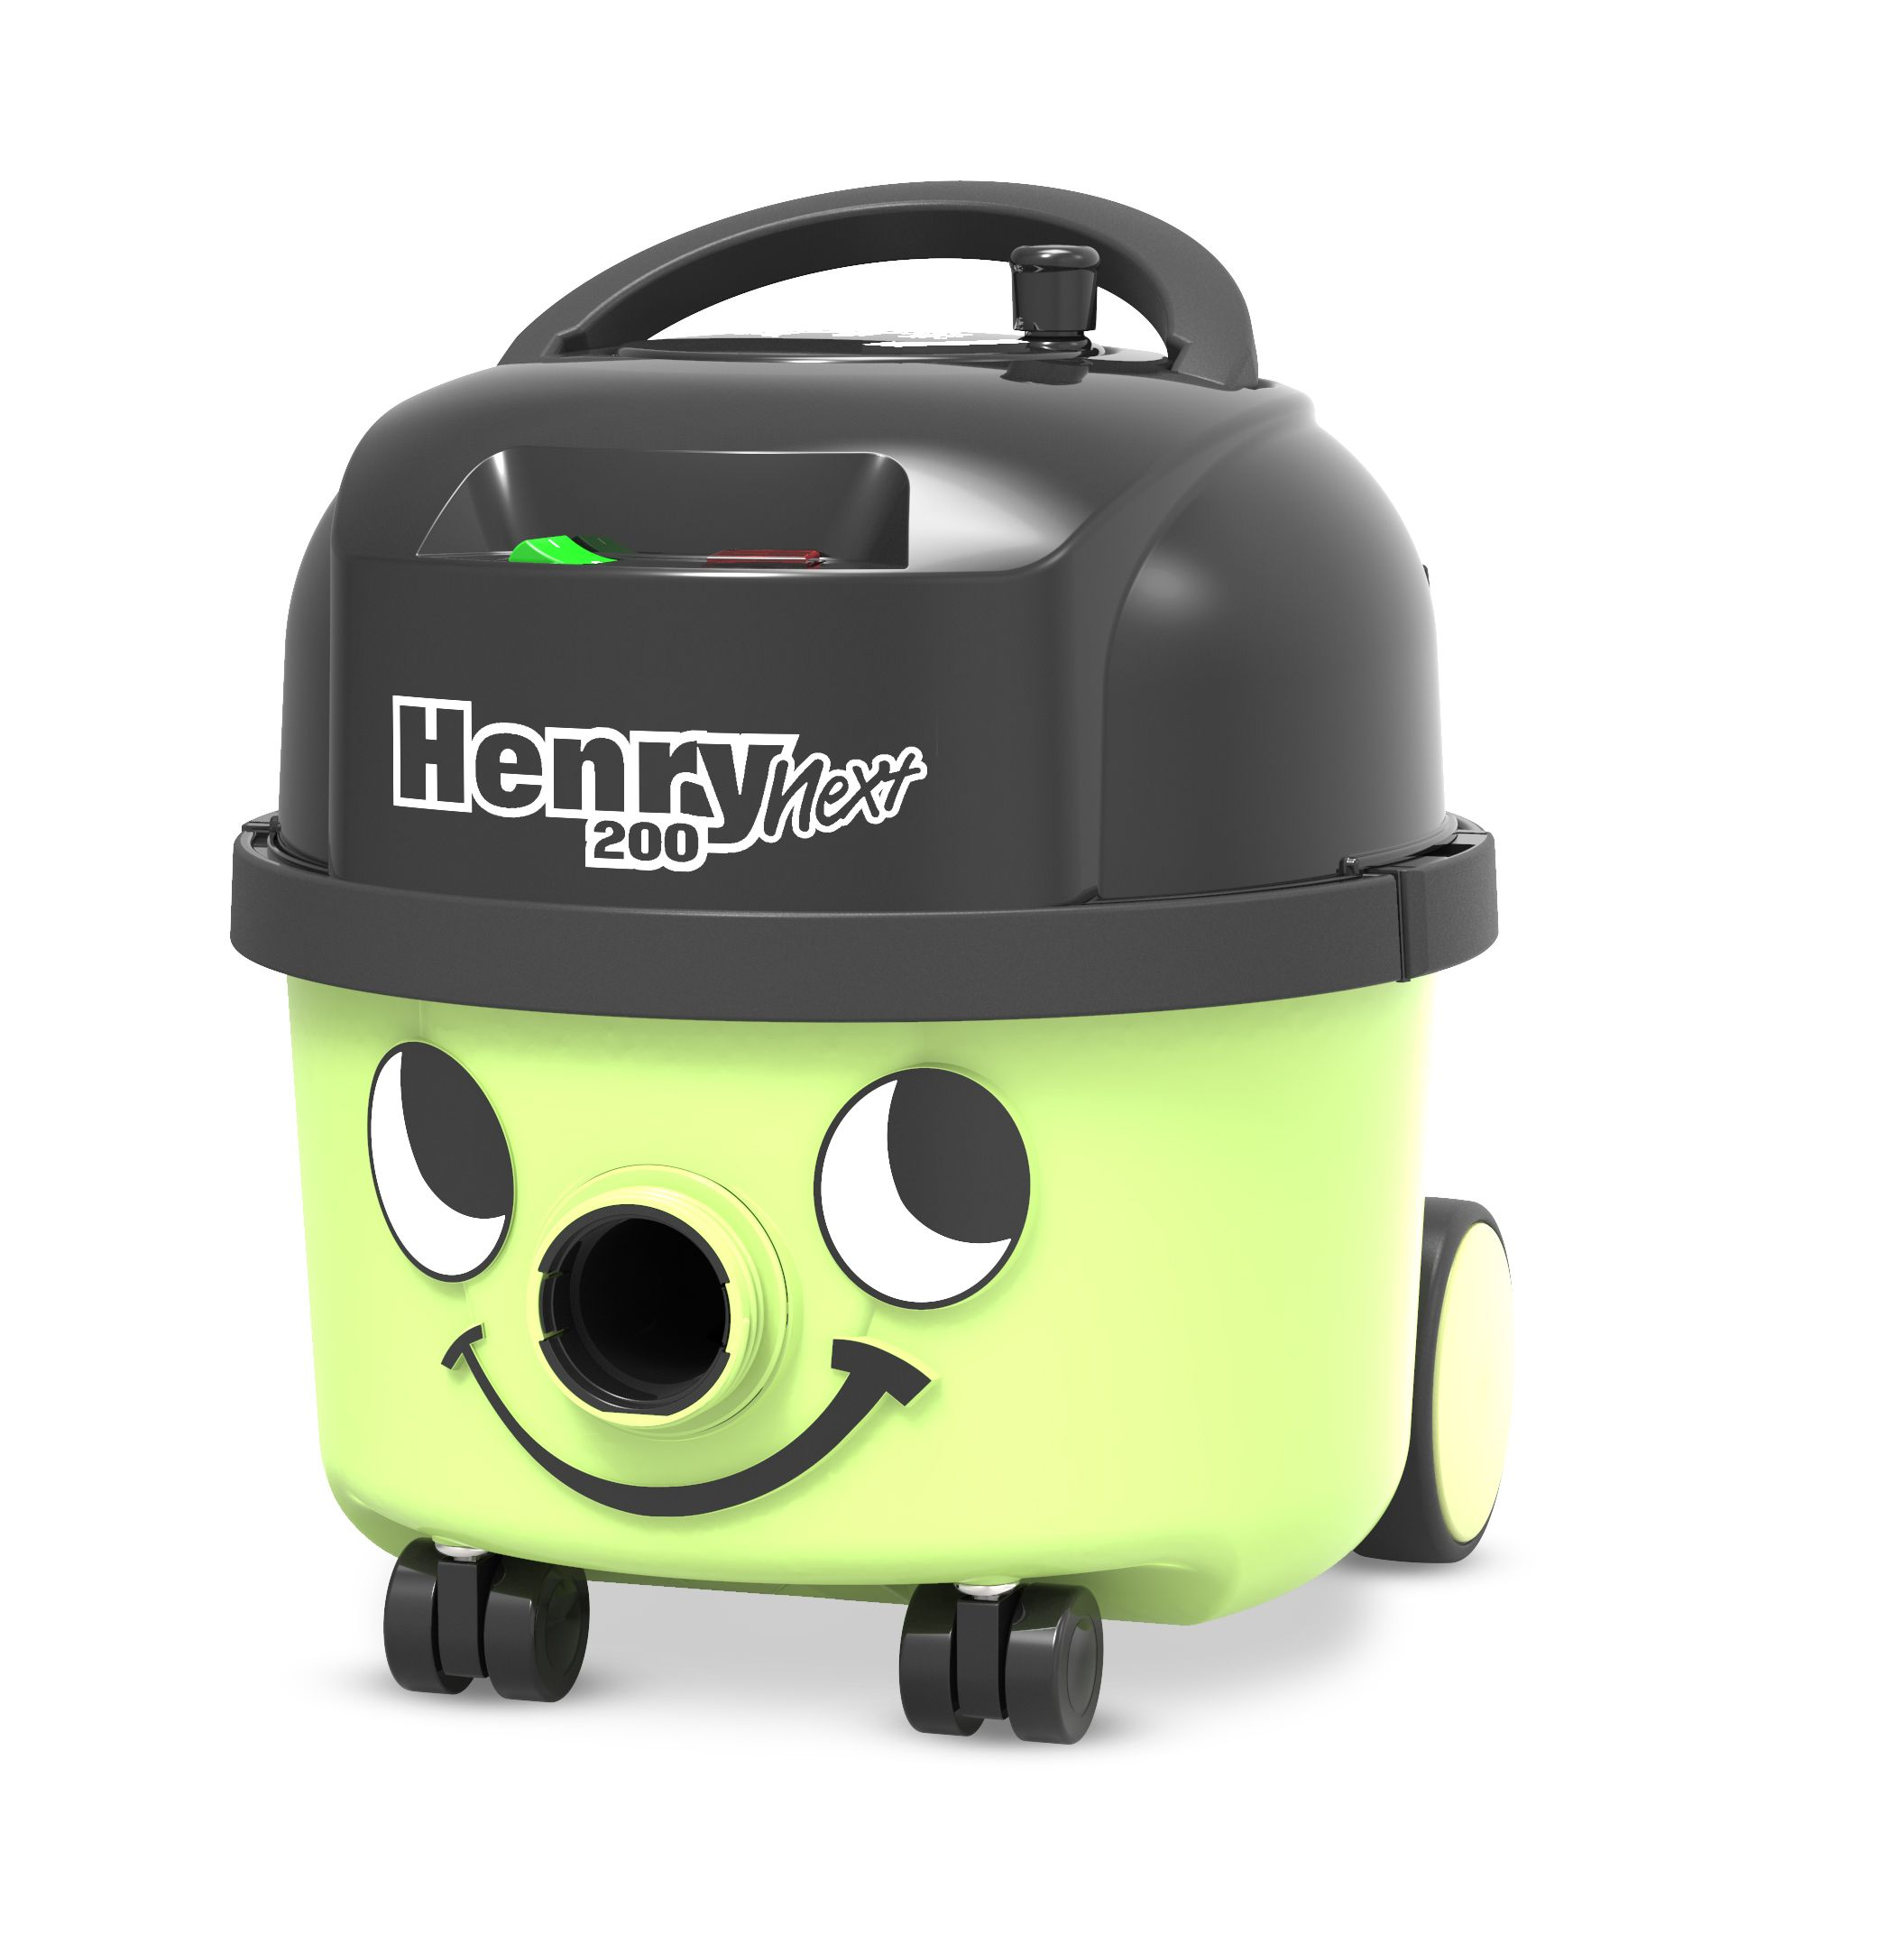 Stofzuiger Henry Next HVN205-11 appelgroen met kit AST0 en 601530